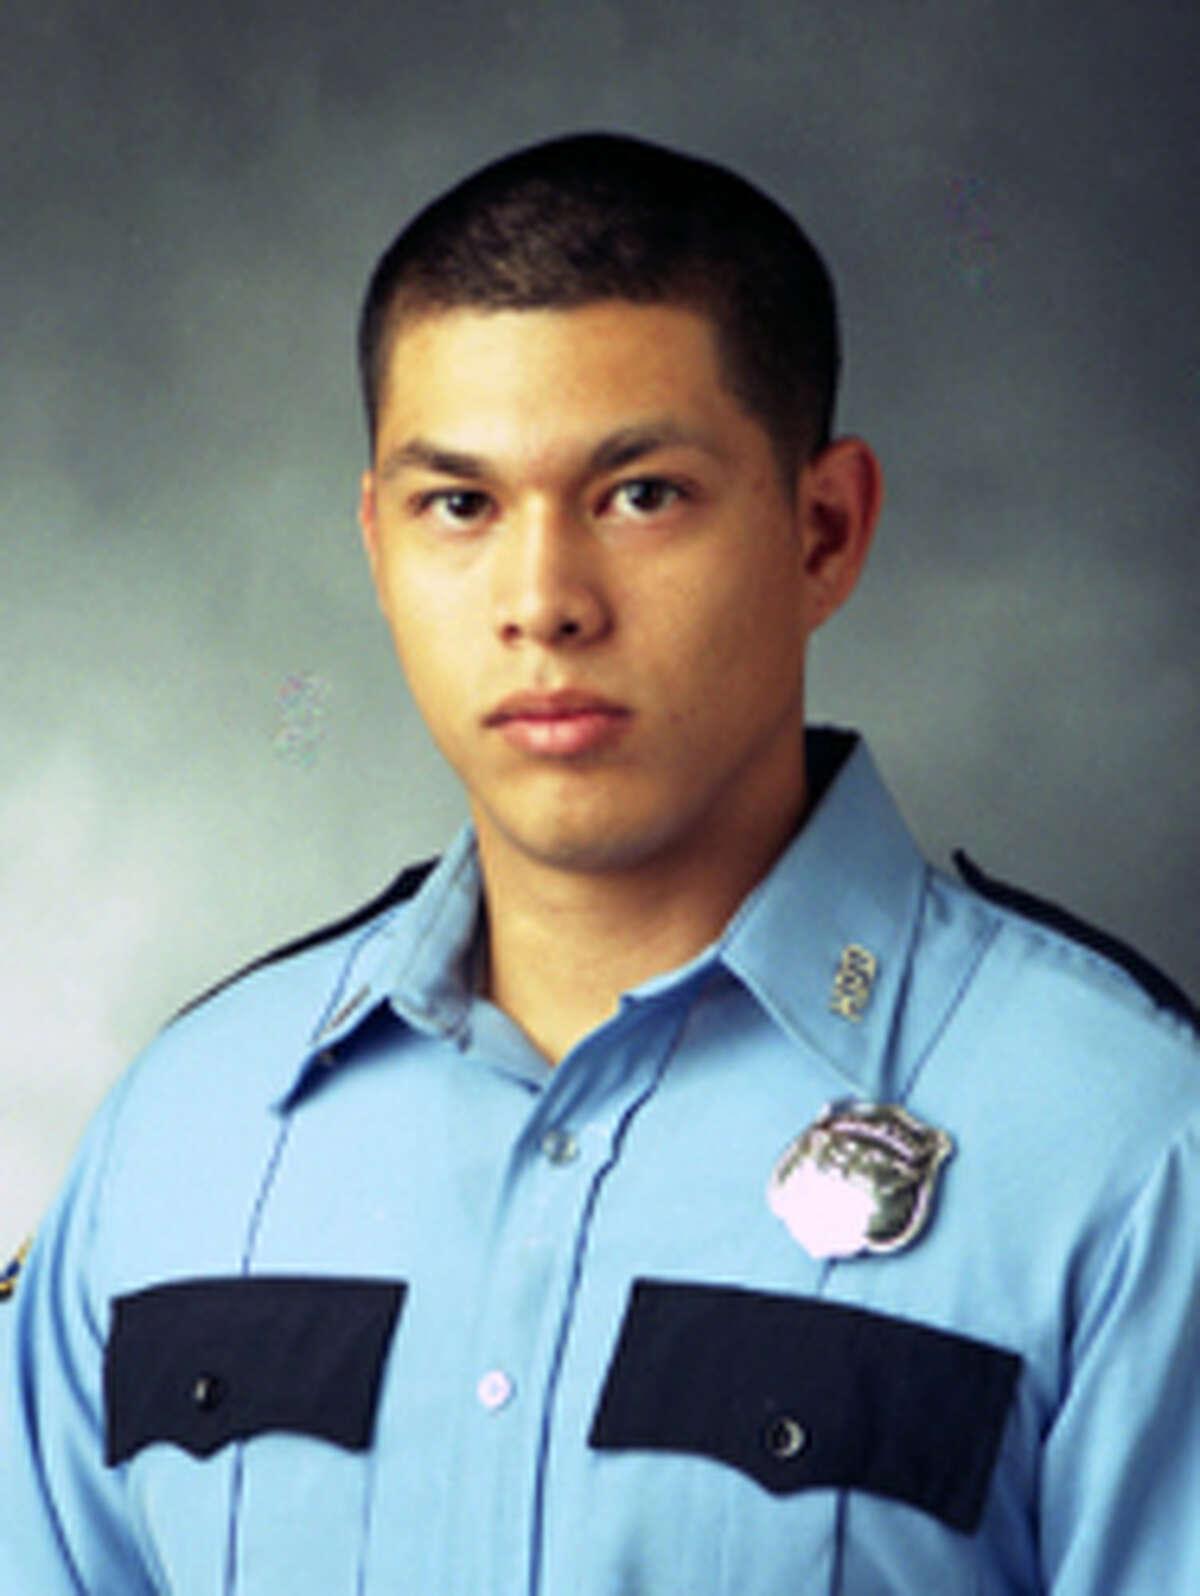 Christopher Zamora, 29,was a rising star at HPD.